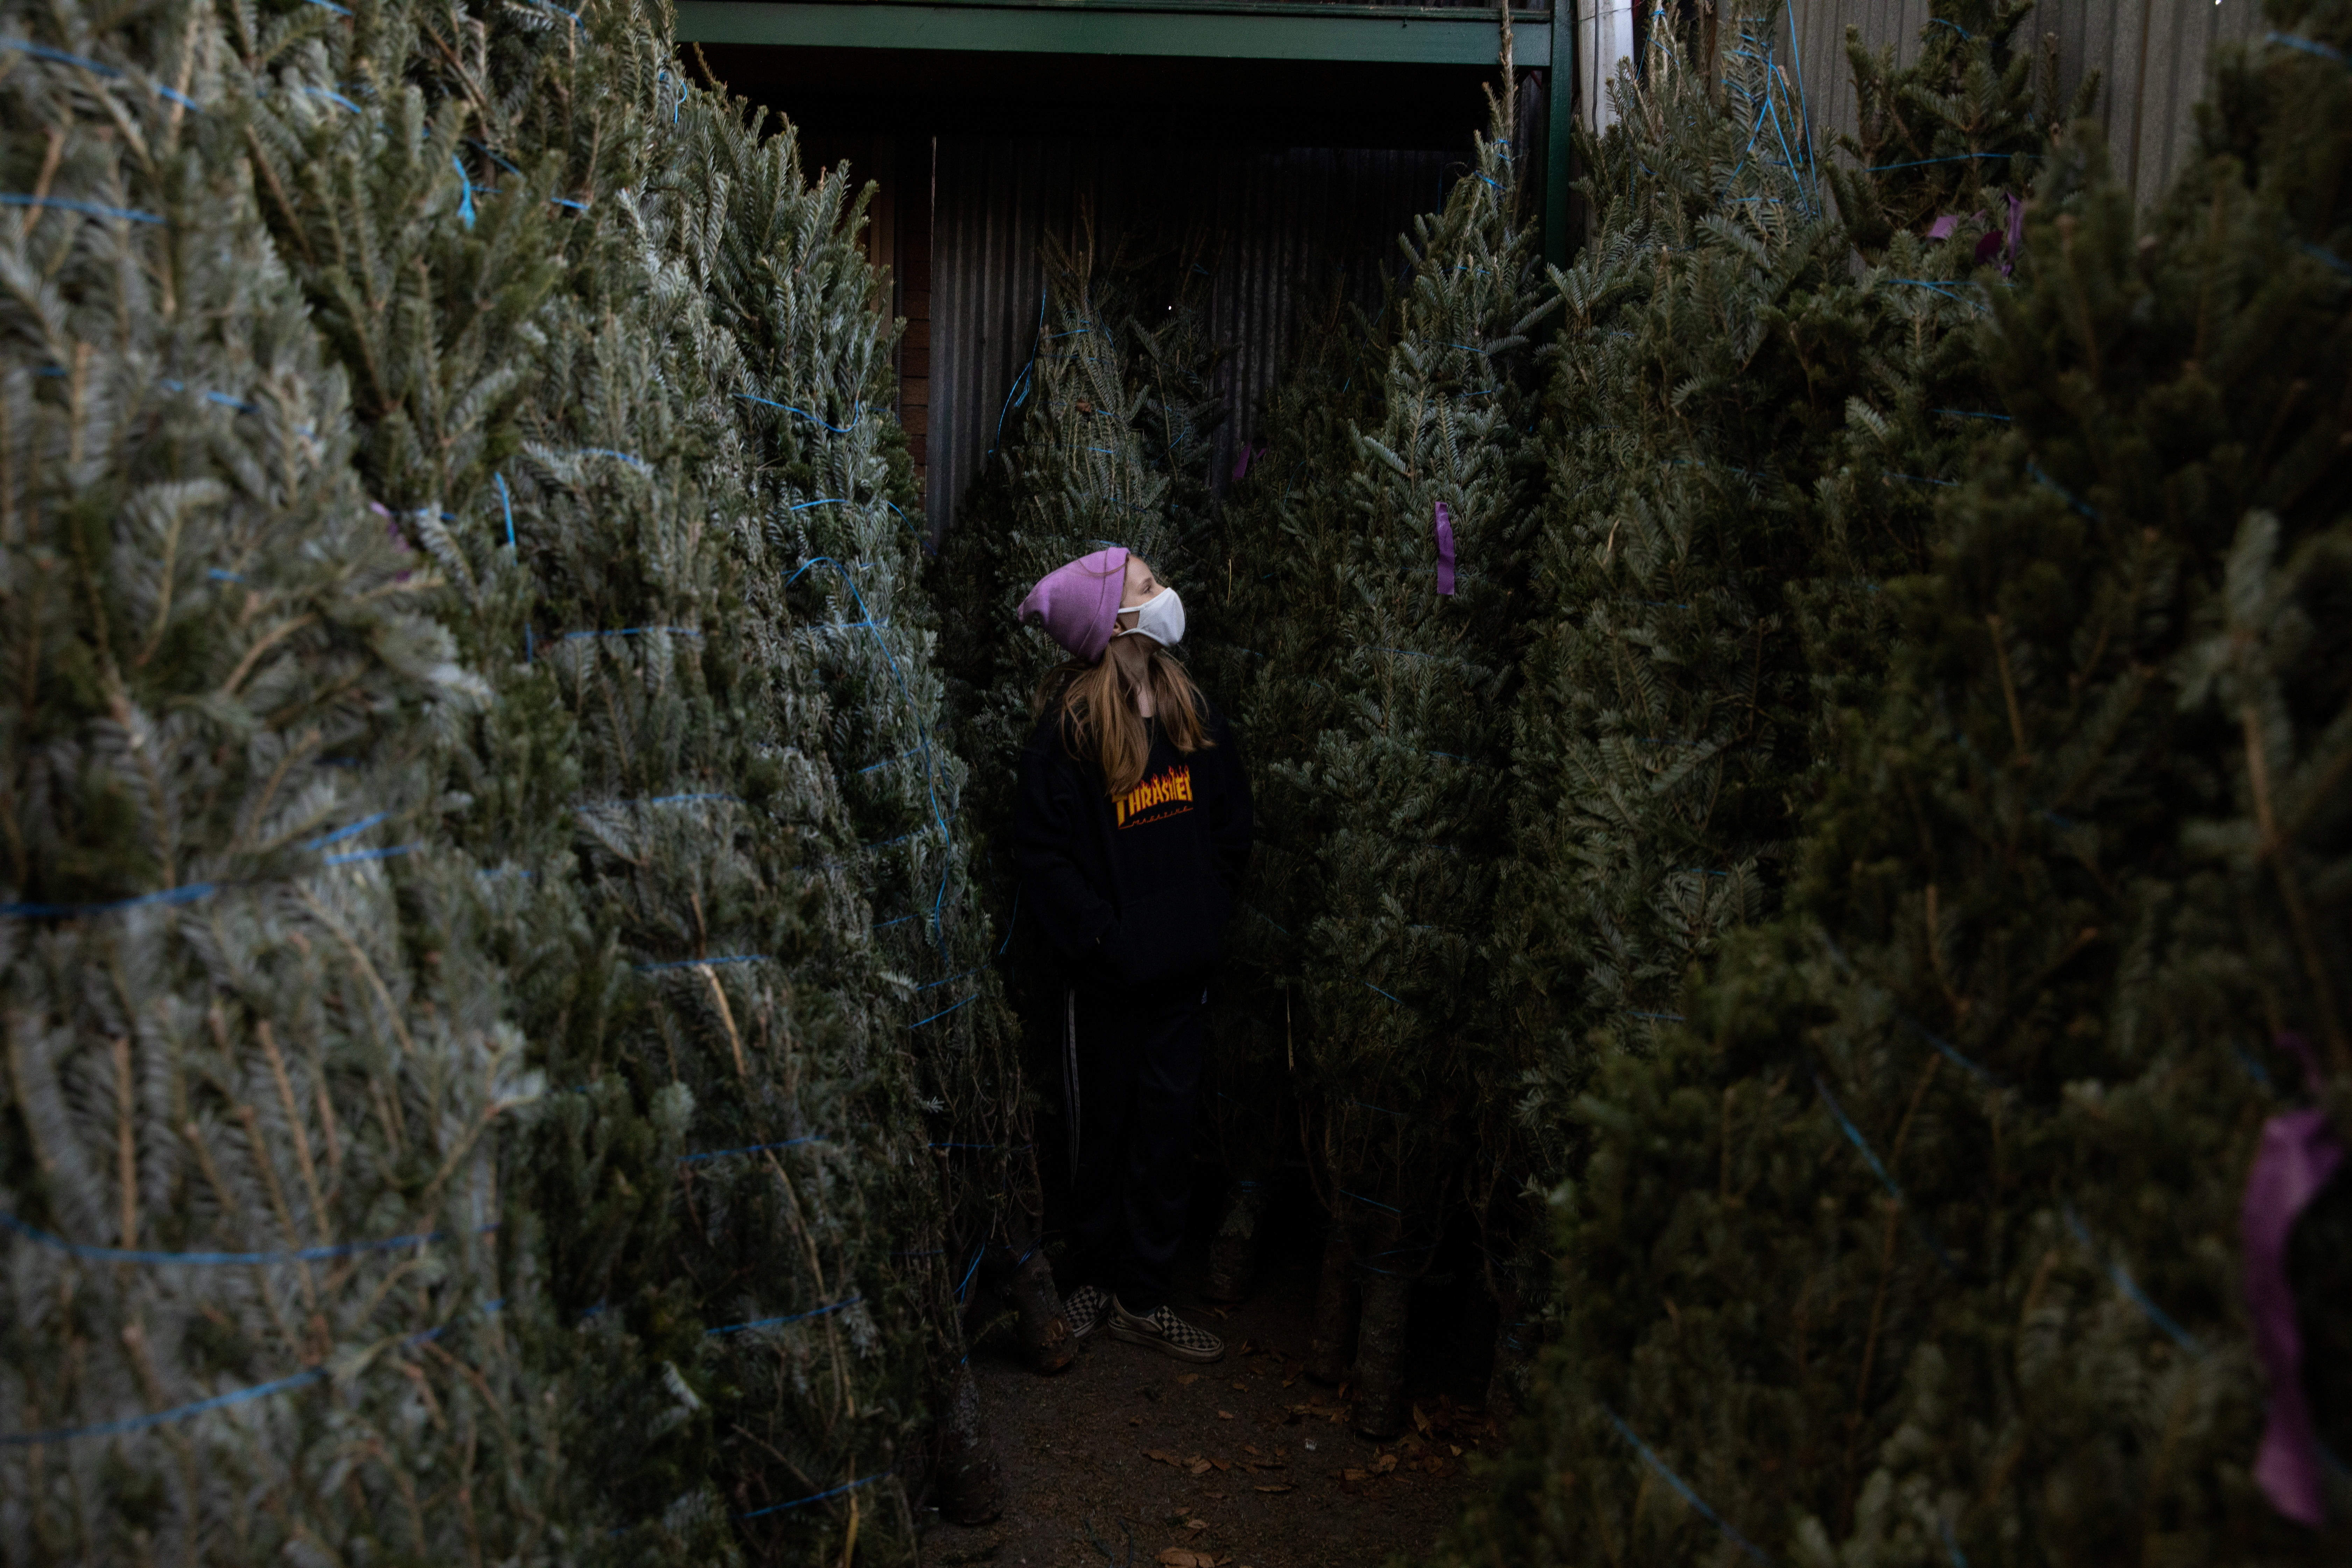 Lydia Hassebroek looks at Christmas trees as the global outbreak of the coronavirus disease (COVID-19) continues, in Brooklyn, New York, U.S., December 6, 2020. REUTERS/Caitlin Ochs - RC23IK9DXDPB